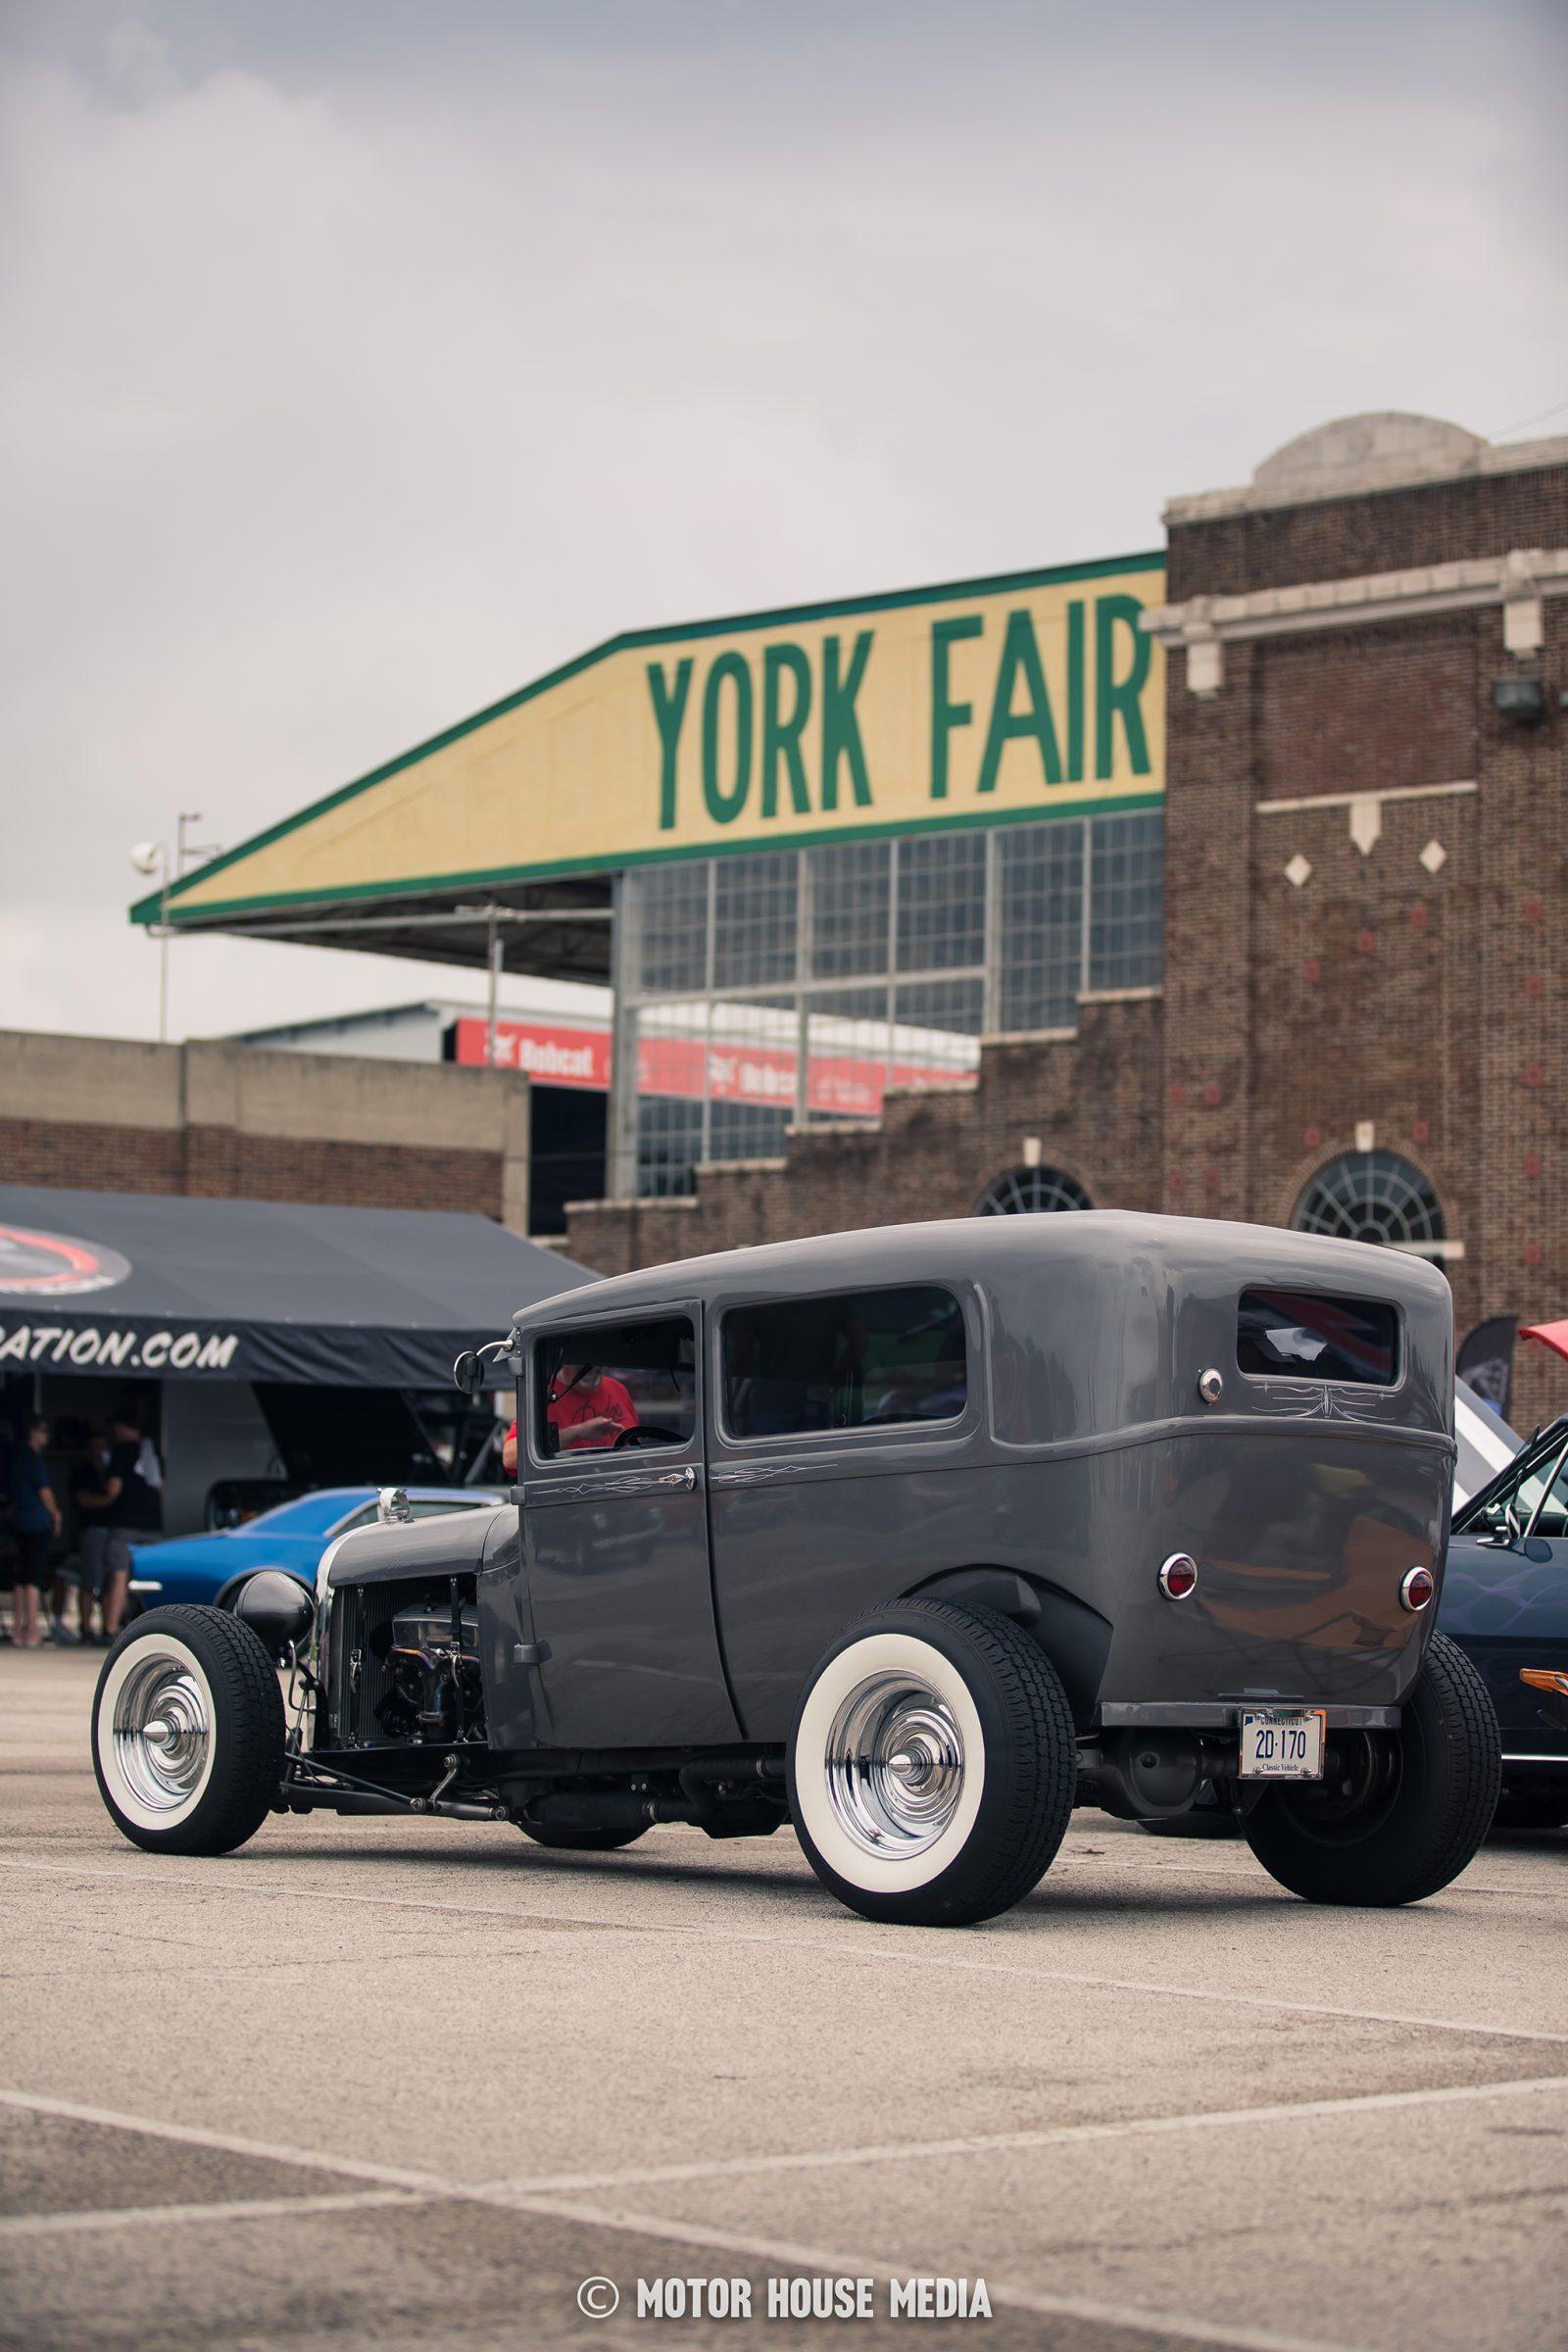 Hot Rod at the Good Guys car show at York Expo center